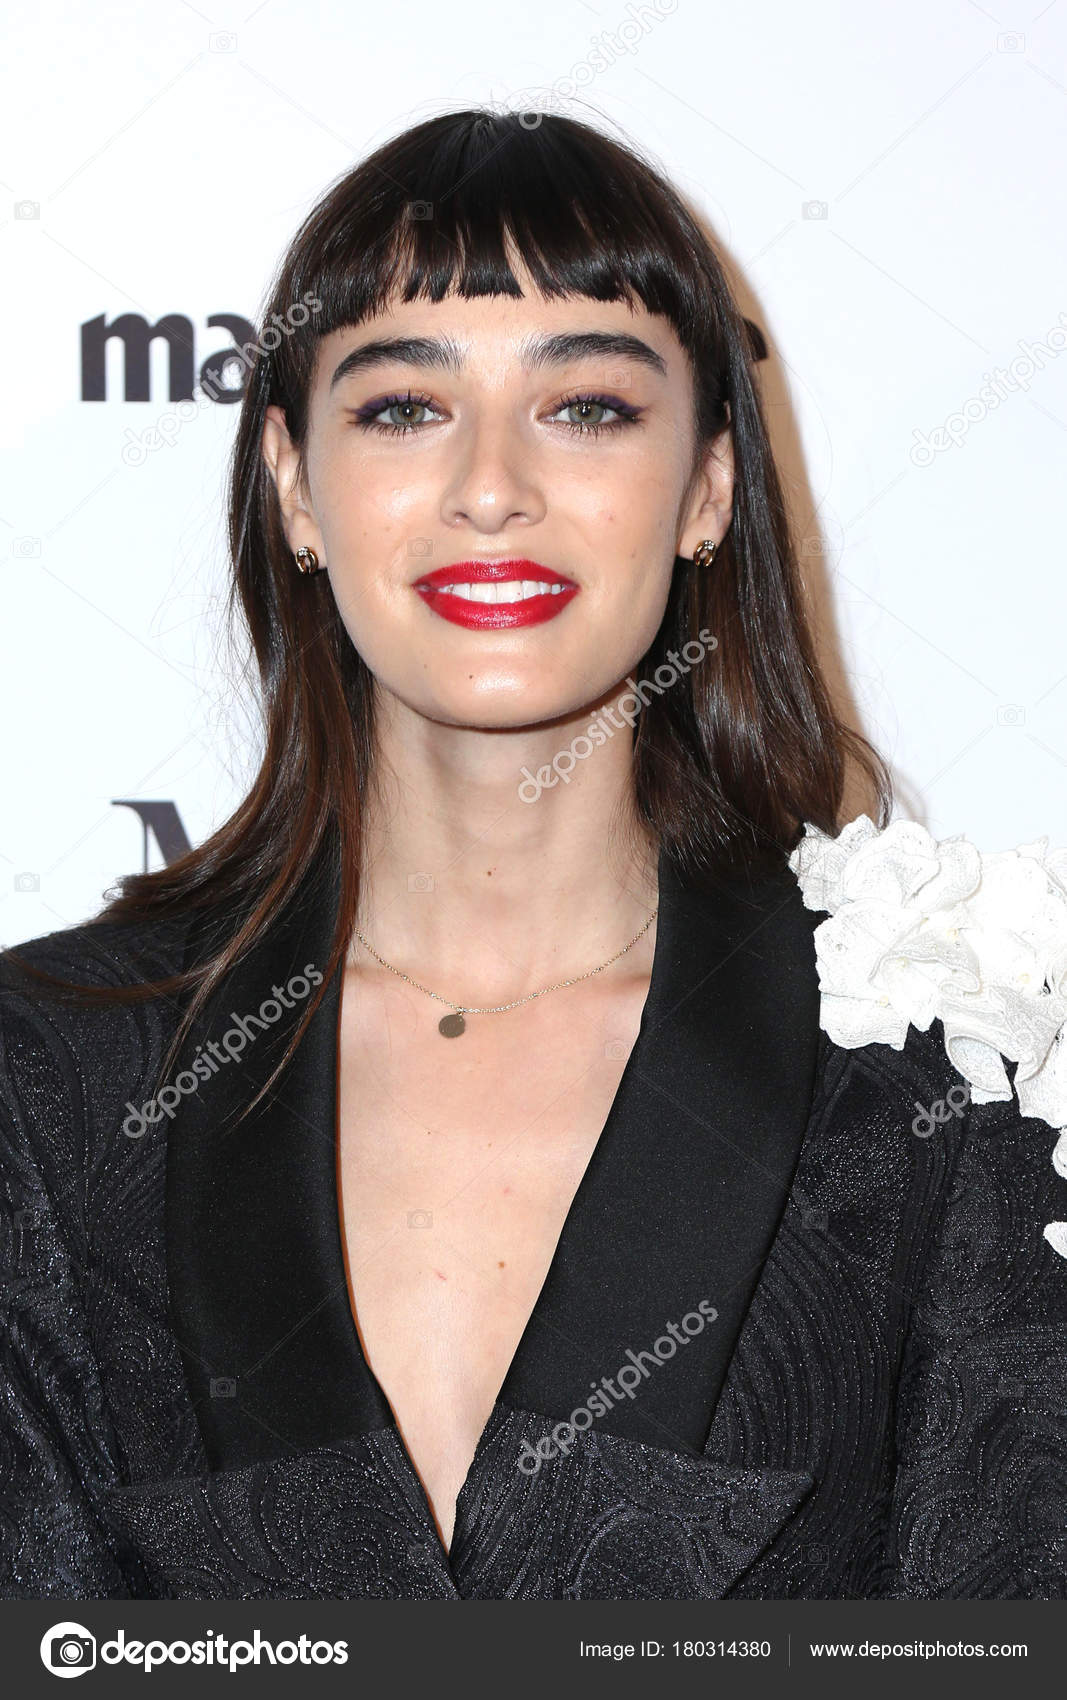 Images Margaux Brooke nude photos 2019